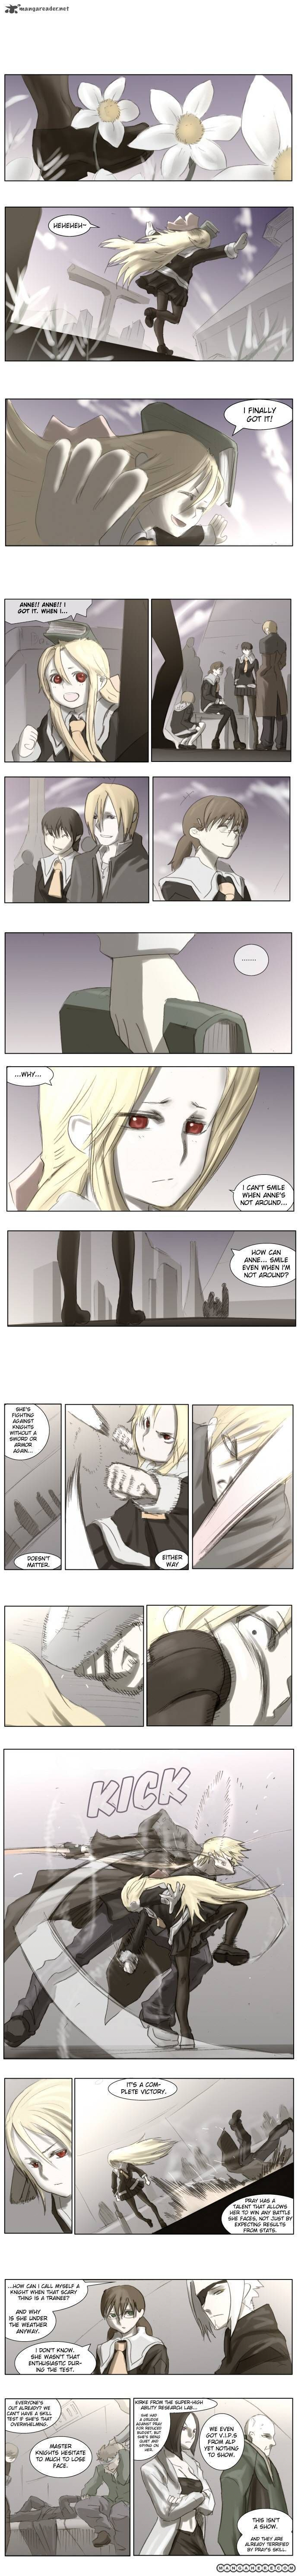 Knight Run 25 Page 1